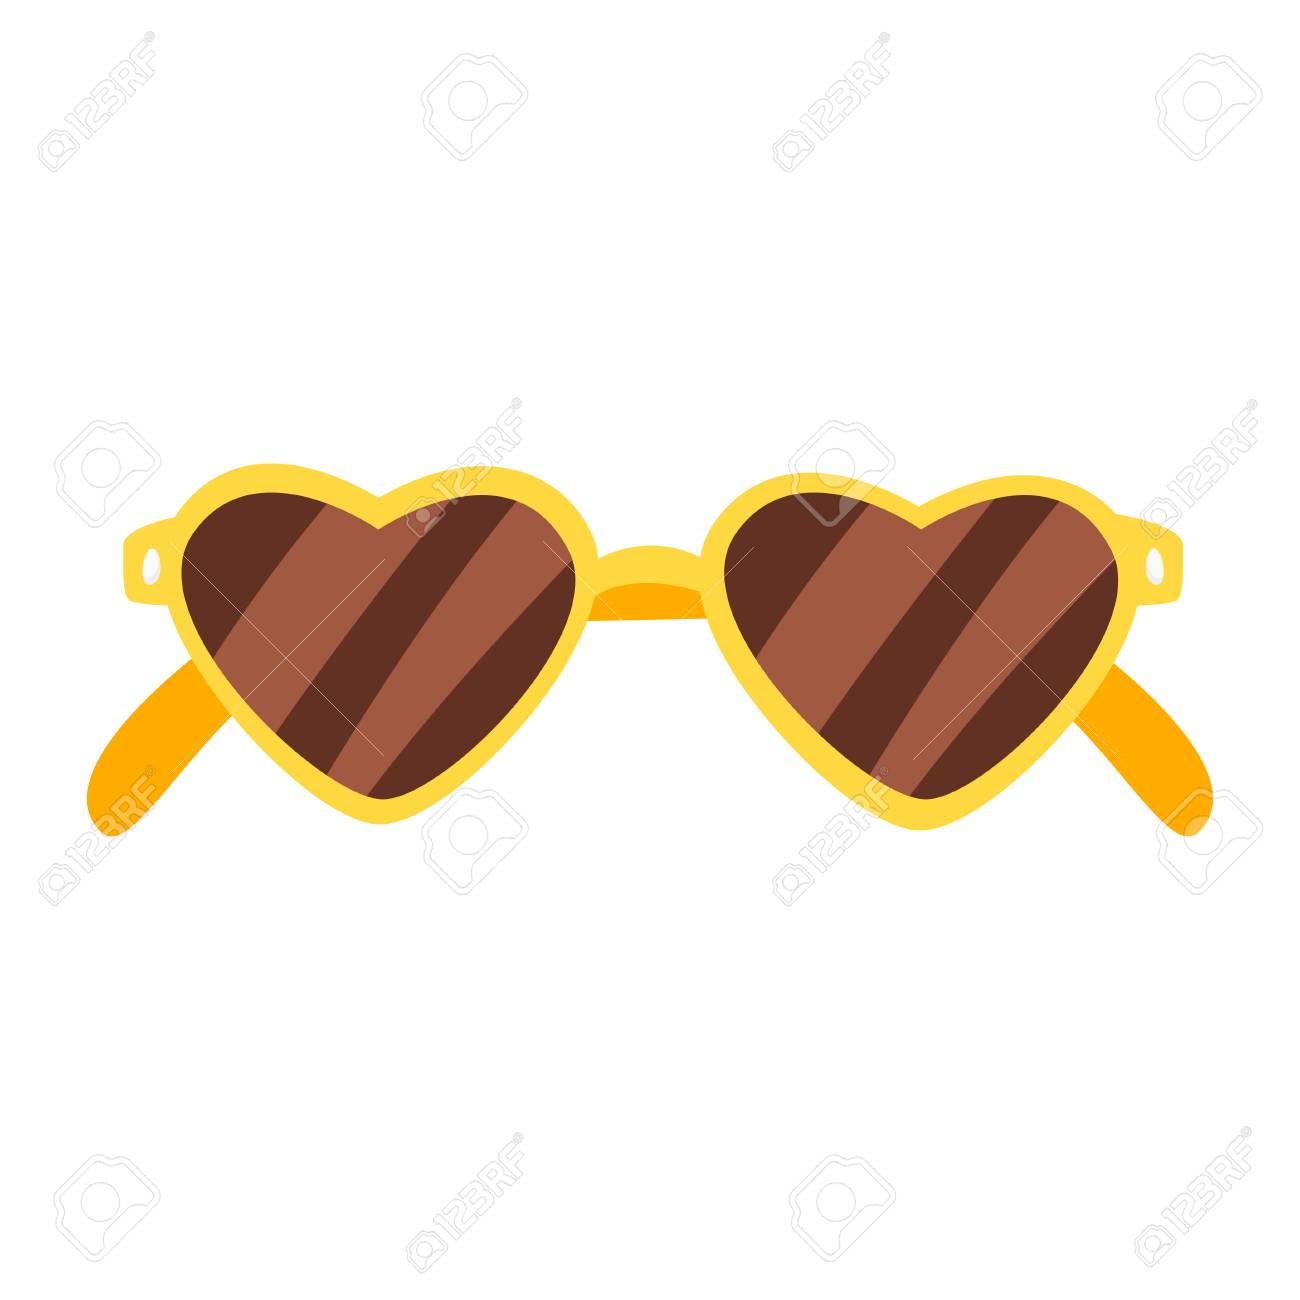 Vector cartoon style illustration of heart shaped sunglasses.